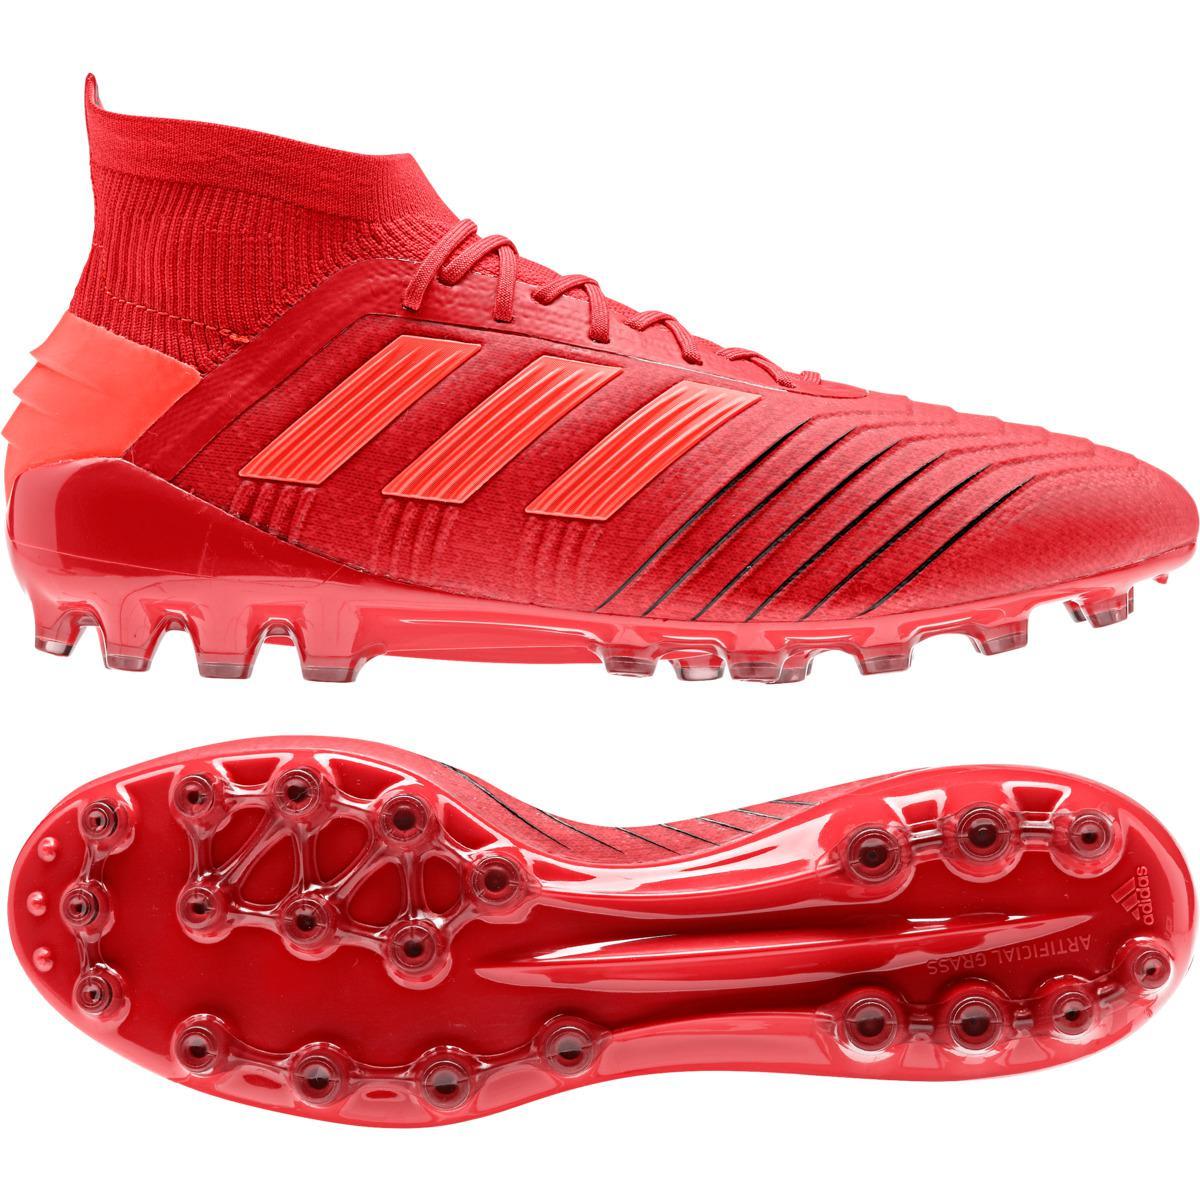 new arrival c307a c64f5 Adidas - Predator 19.1 Ag Football Boots for Men - Lyst. View fullscreen